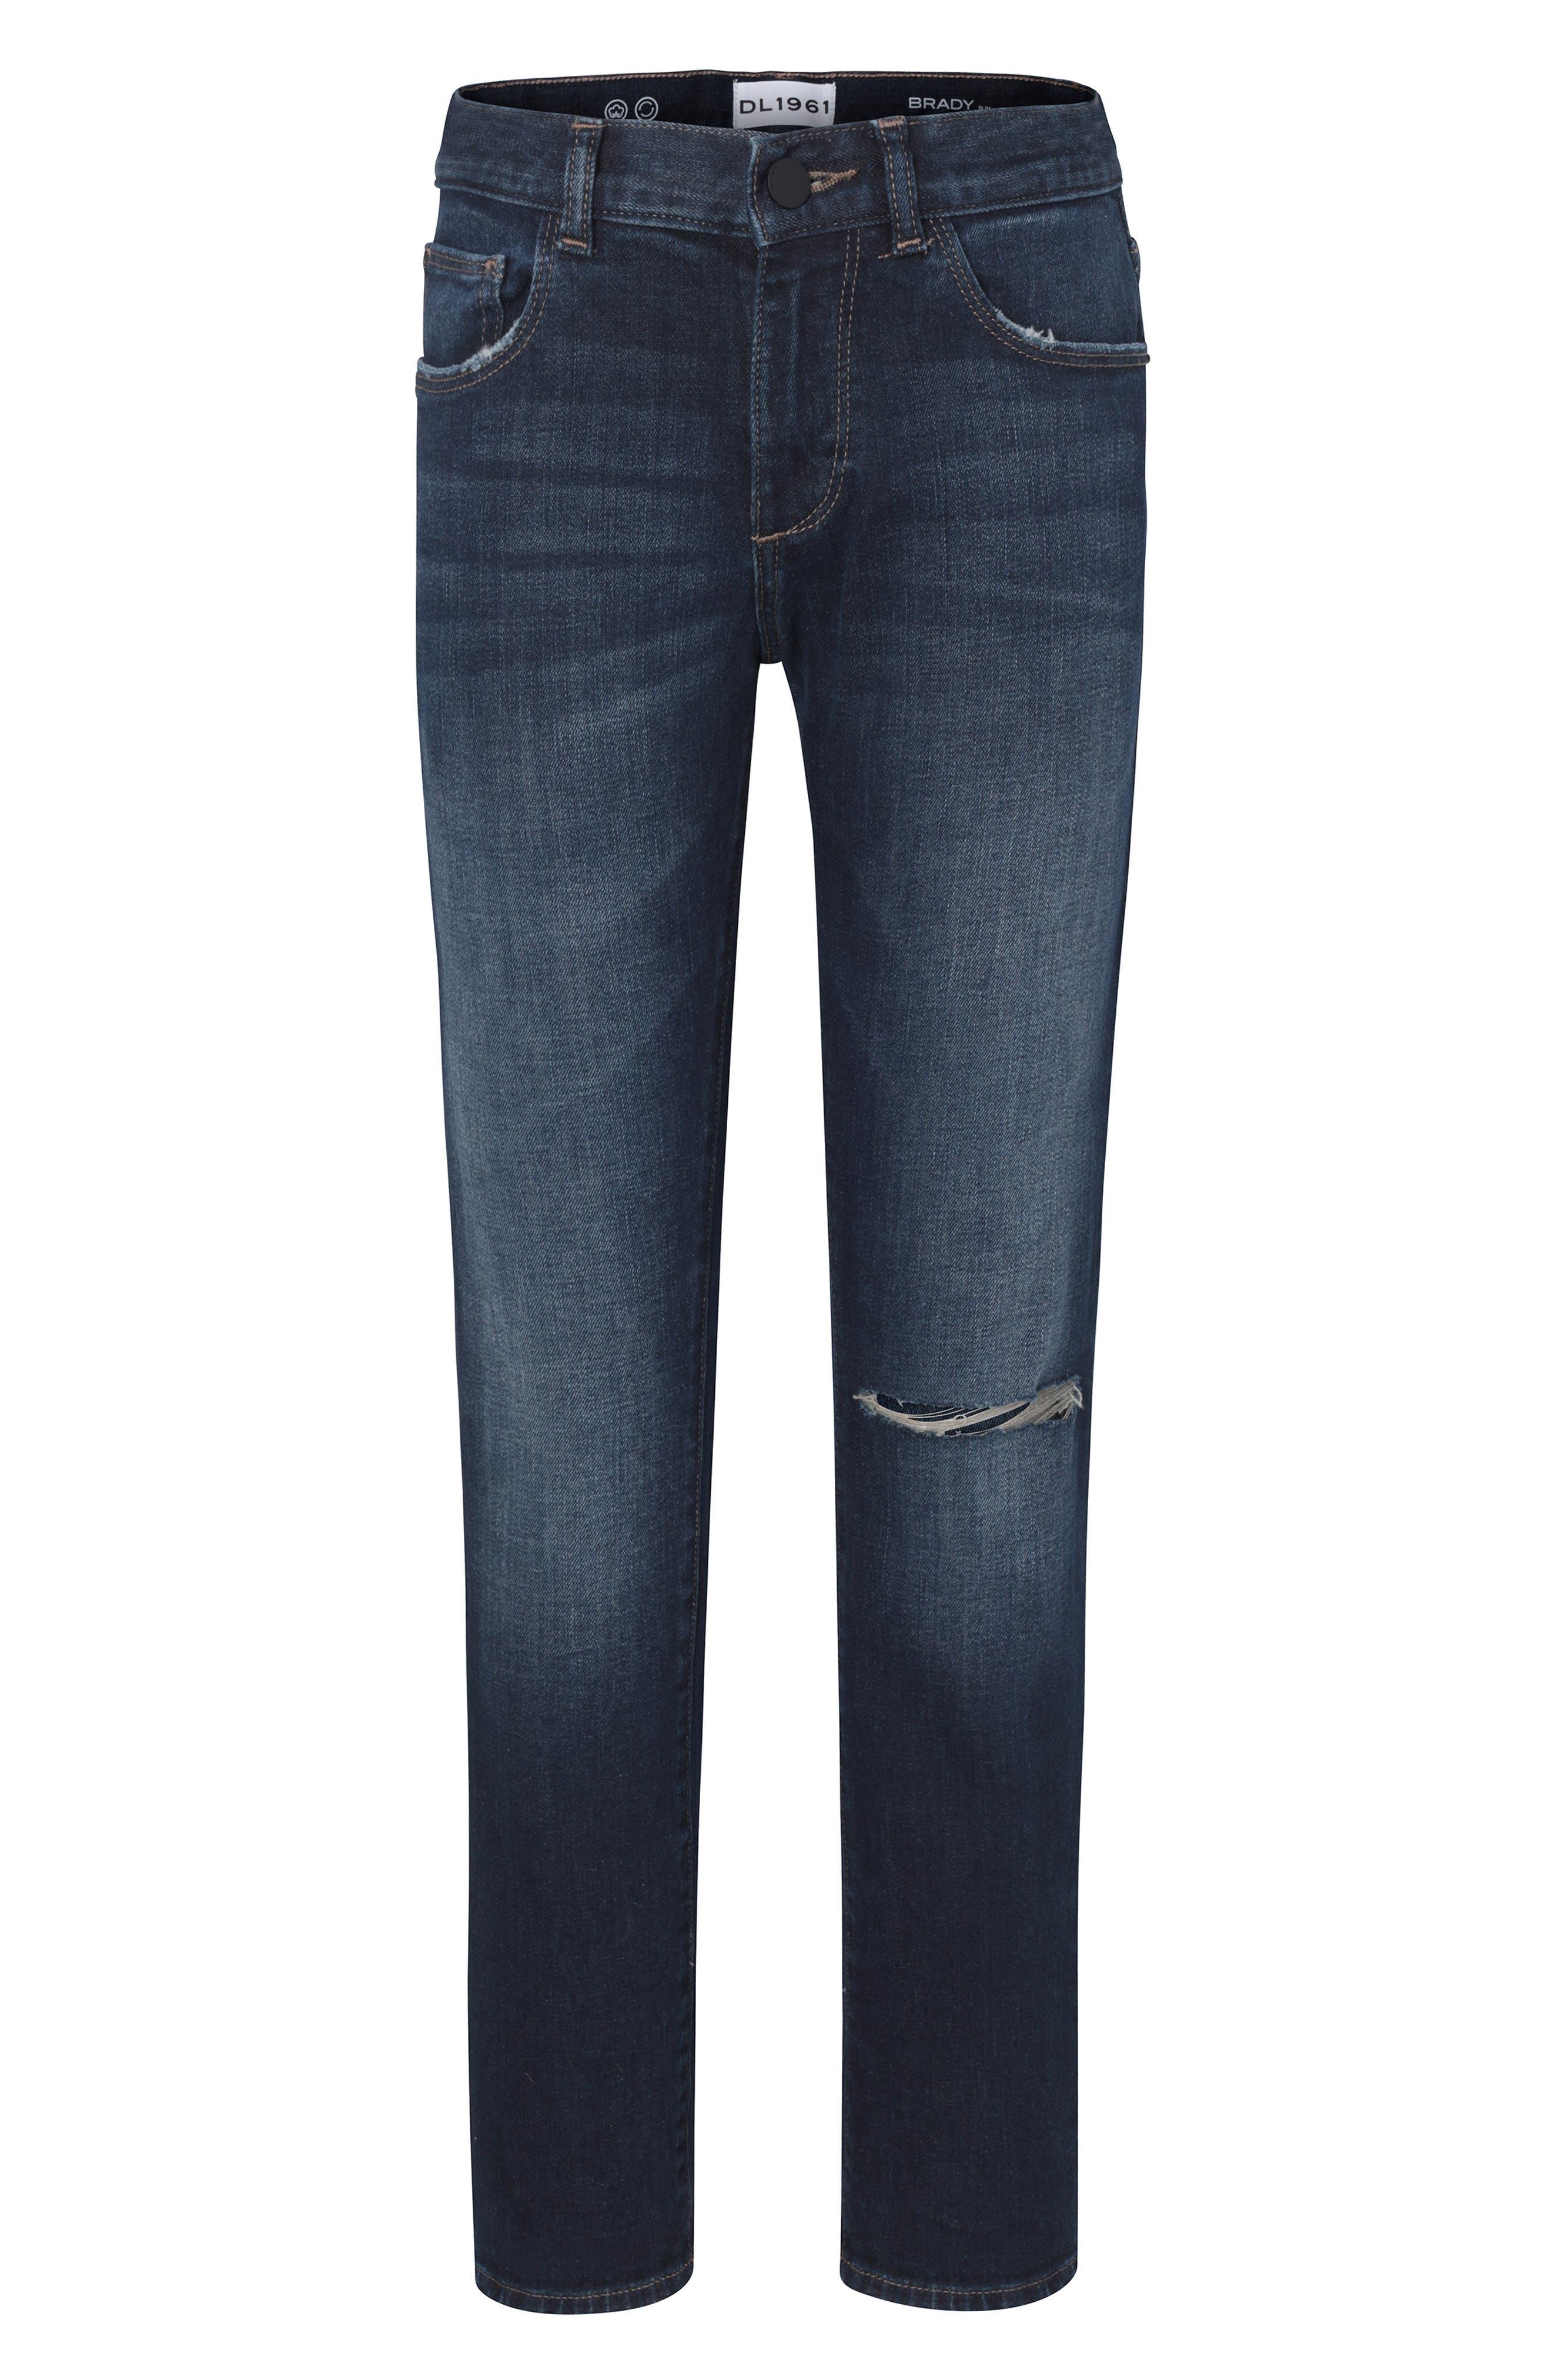 Brady Distressed Slim Fit Jeans,                         Main,                         color, BLUE